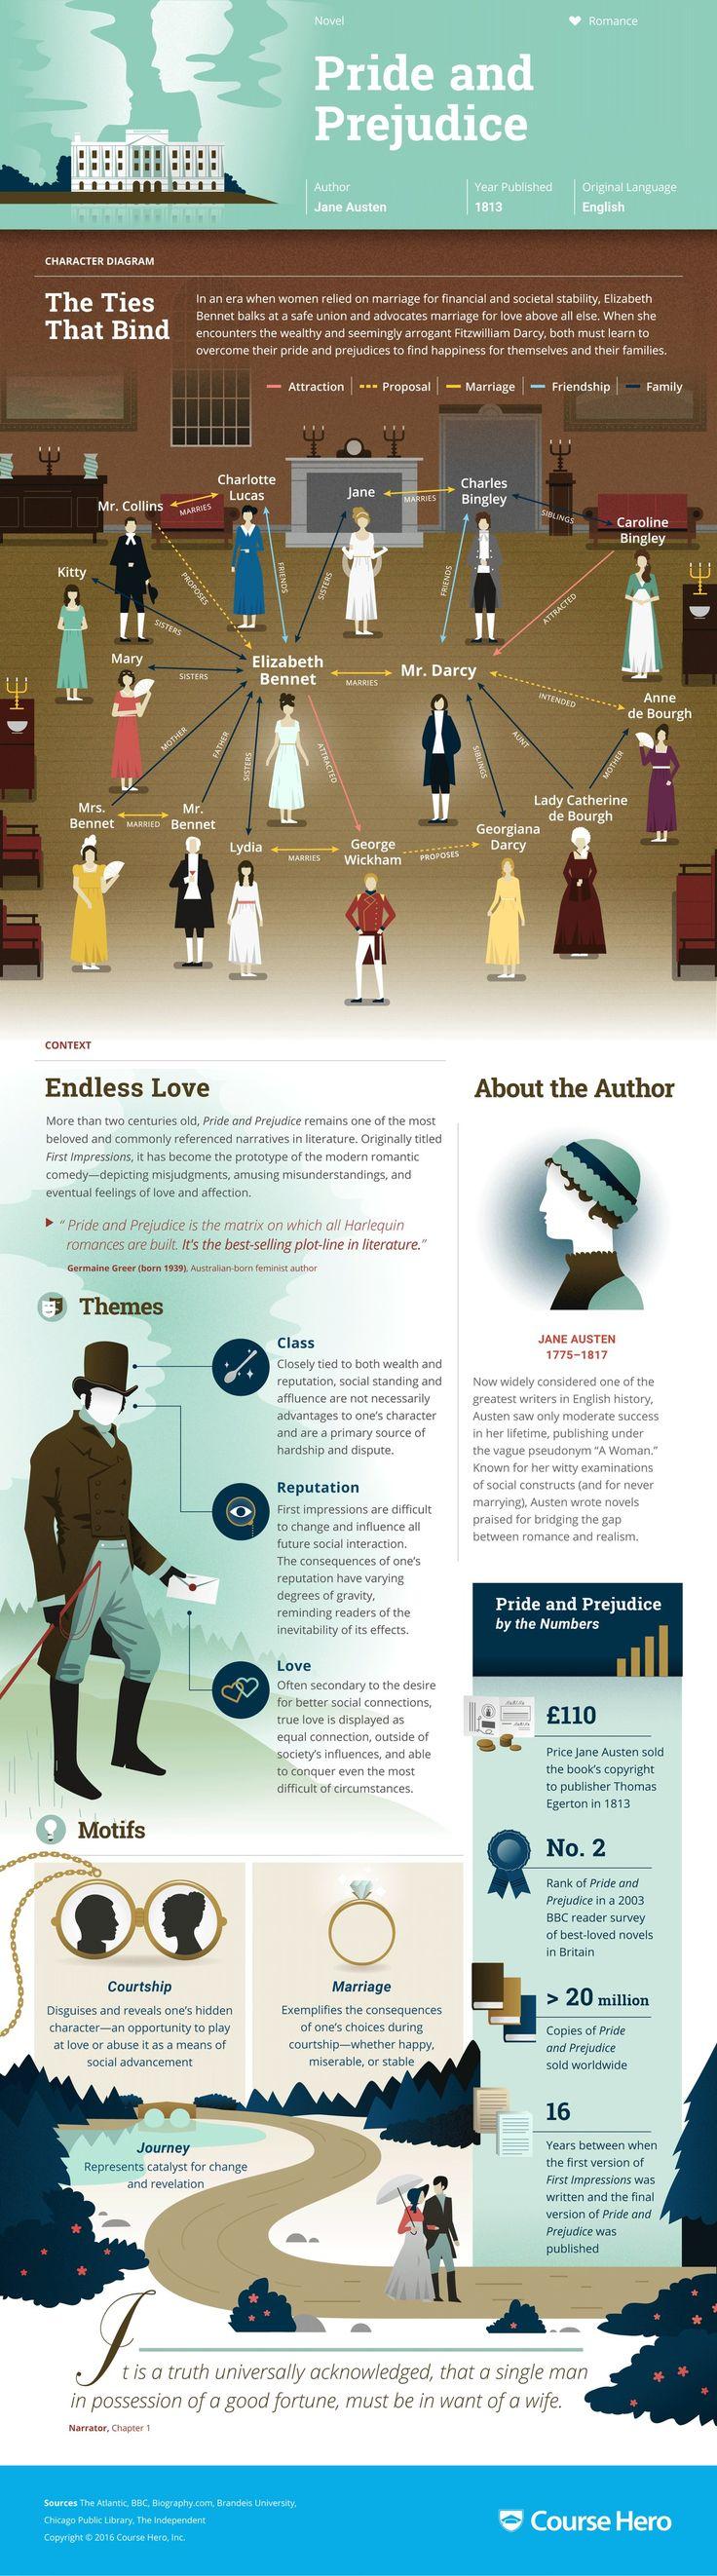 https://www.coursehero.com/books/Jane-Austen/Pride-and-Prejudice/